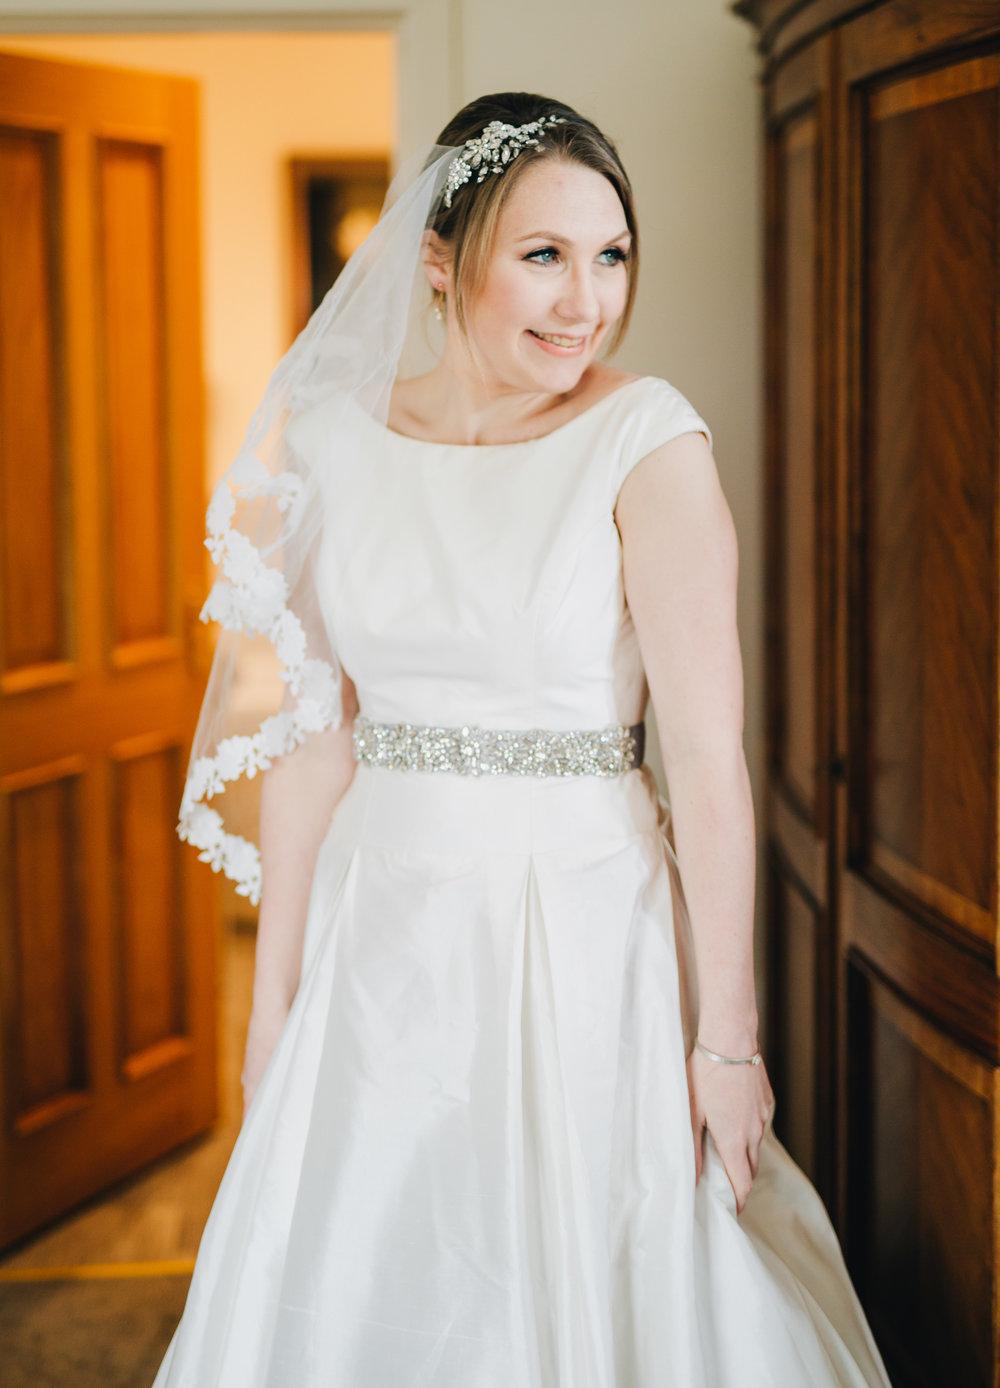 One of the brides, same sex wedding, Pastel themed wedding, Lake District wedding venue.